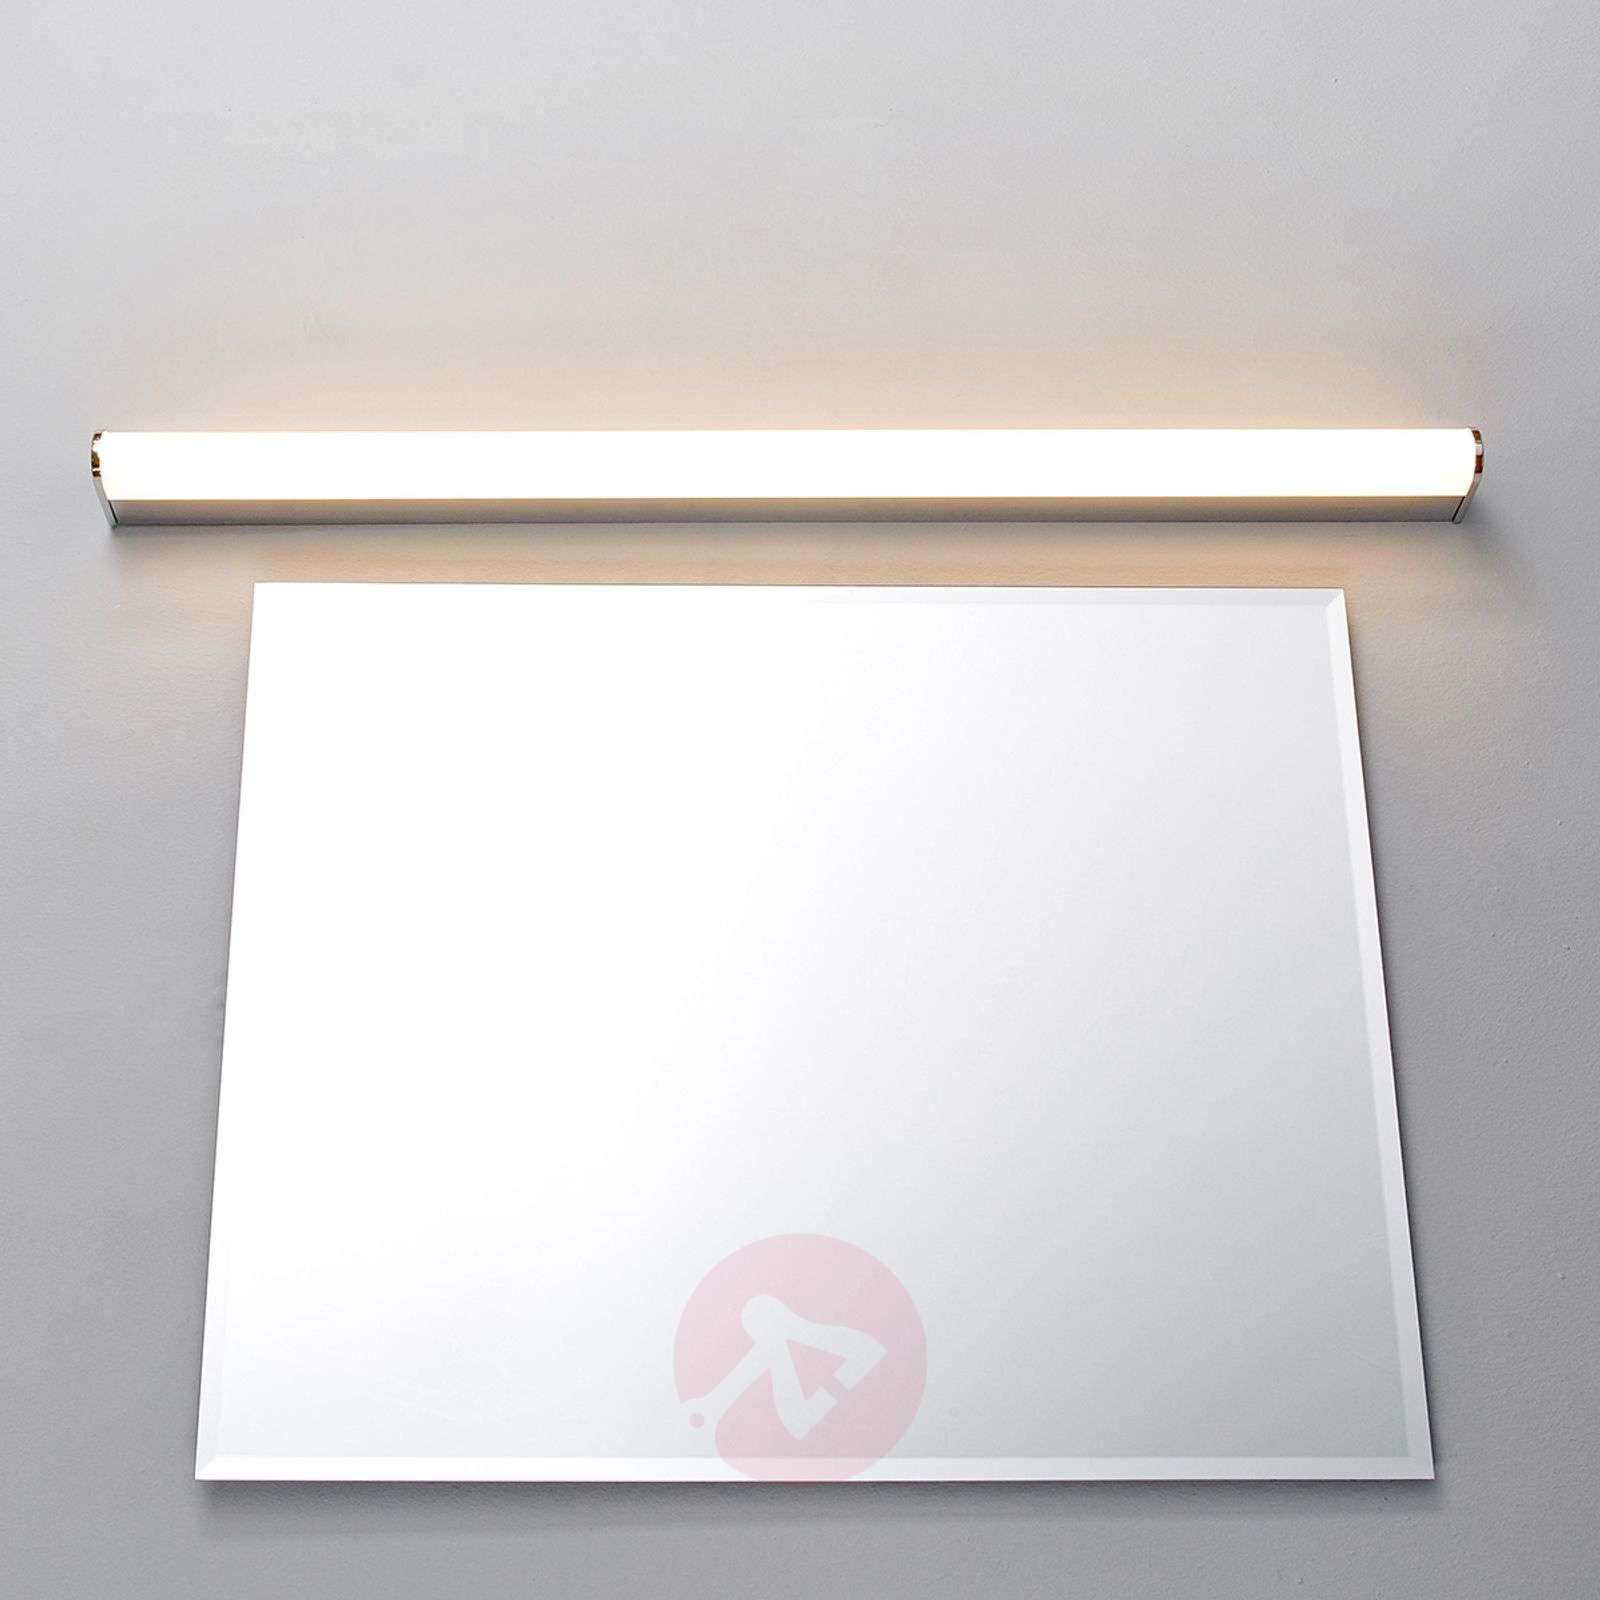 Philippa bathroom/mirror light semi-circle 88cm-9641013-01